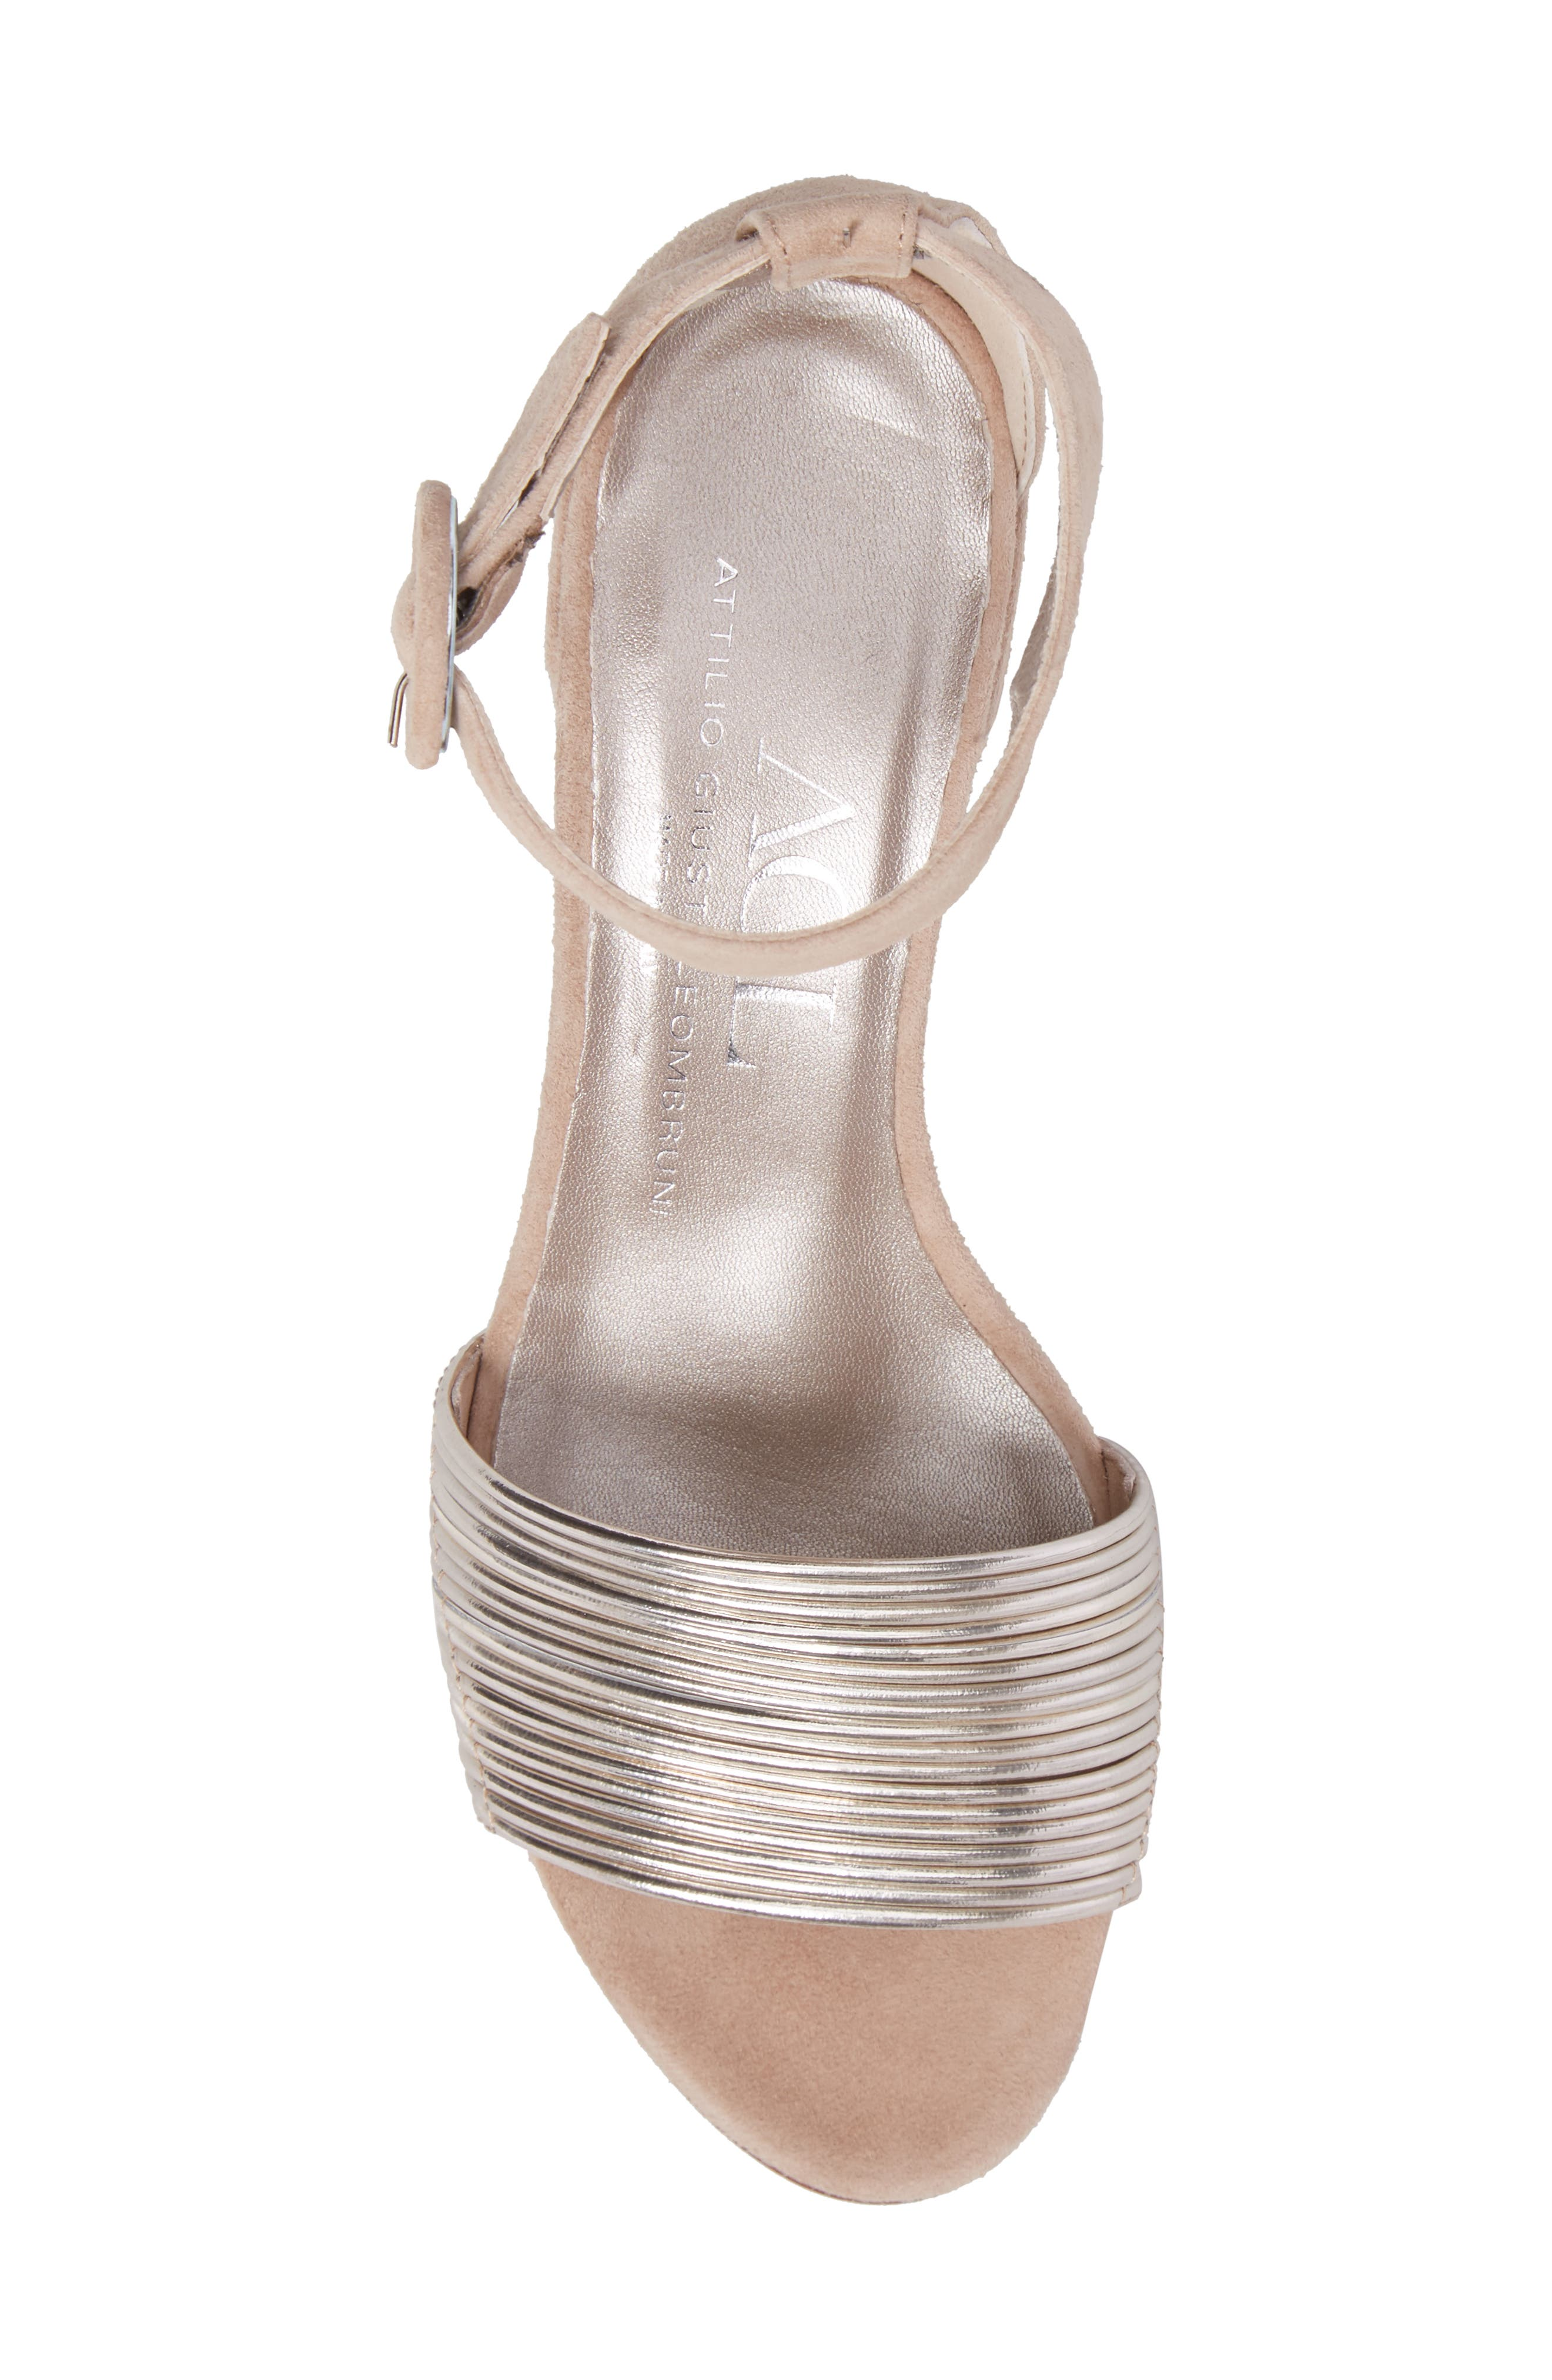 Ankle Strap Sandal,                             Alternate thumbnail 5, color,                             Platinum Leather